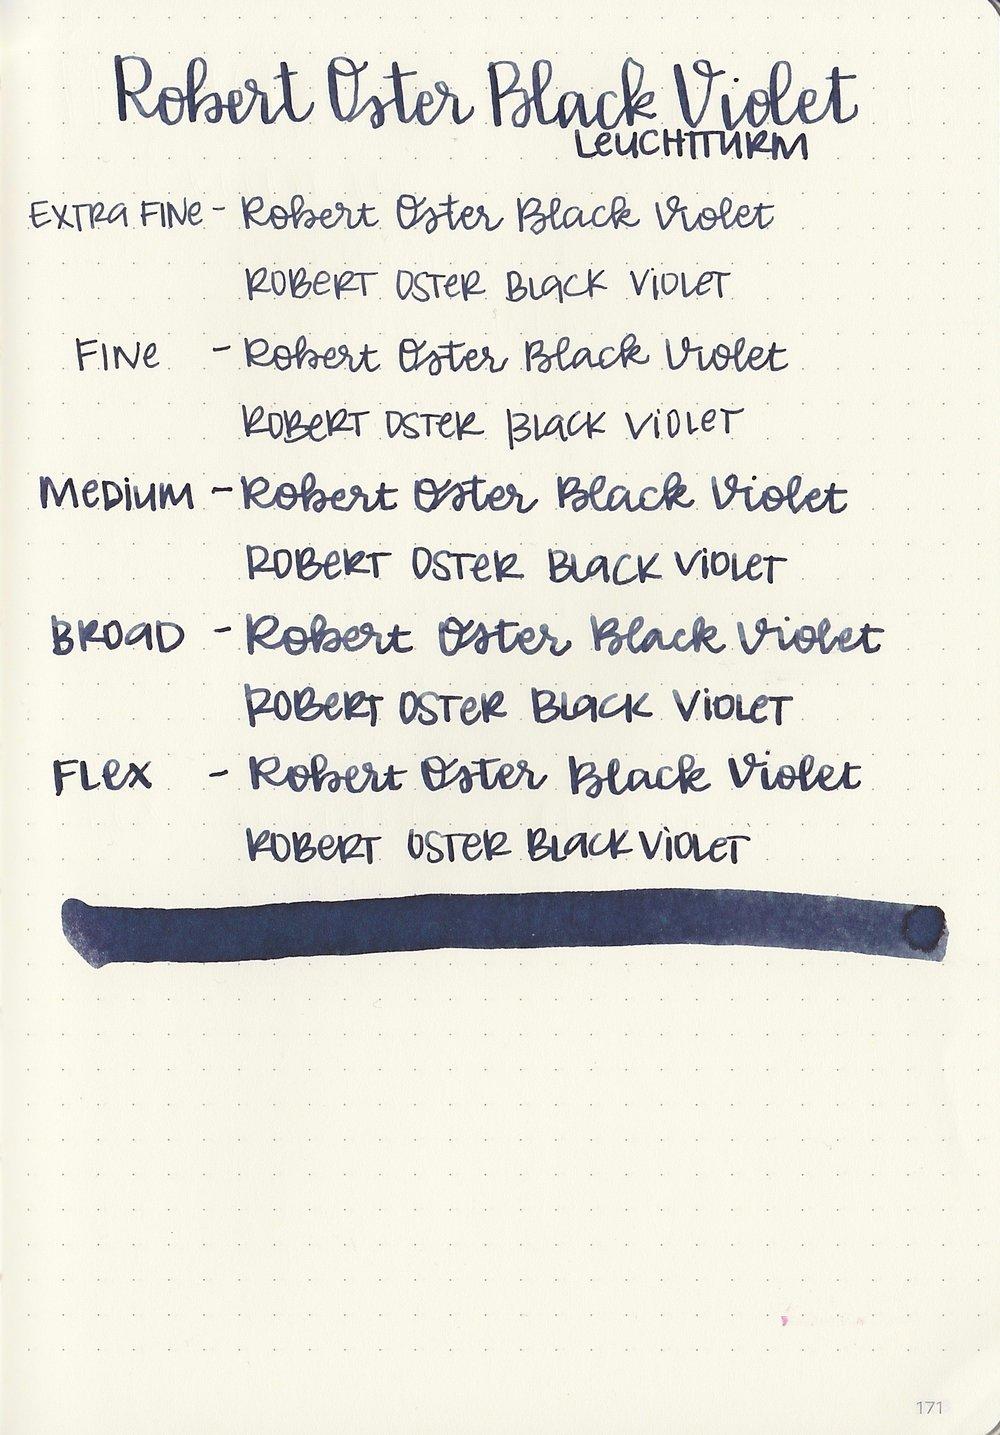 ROBlackViolet - 14.jpg